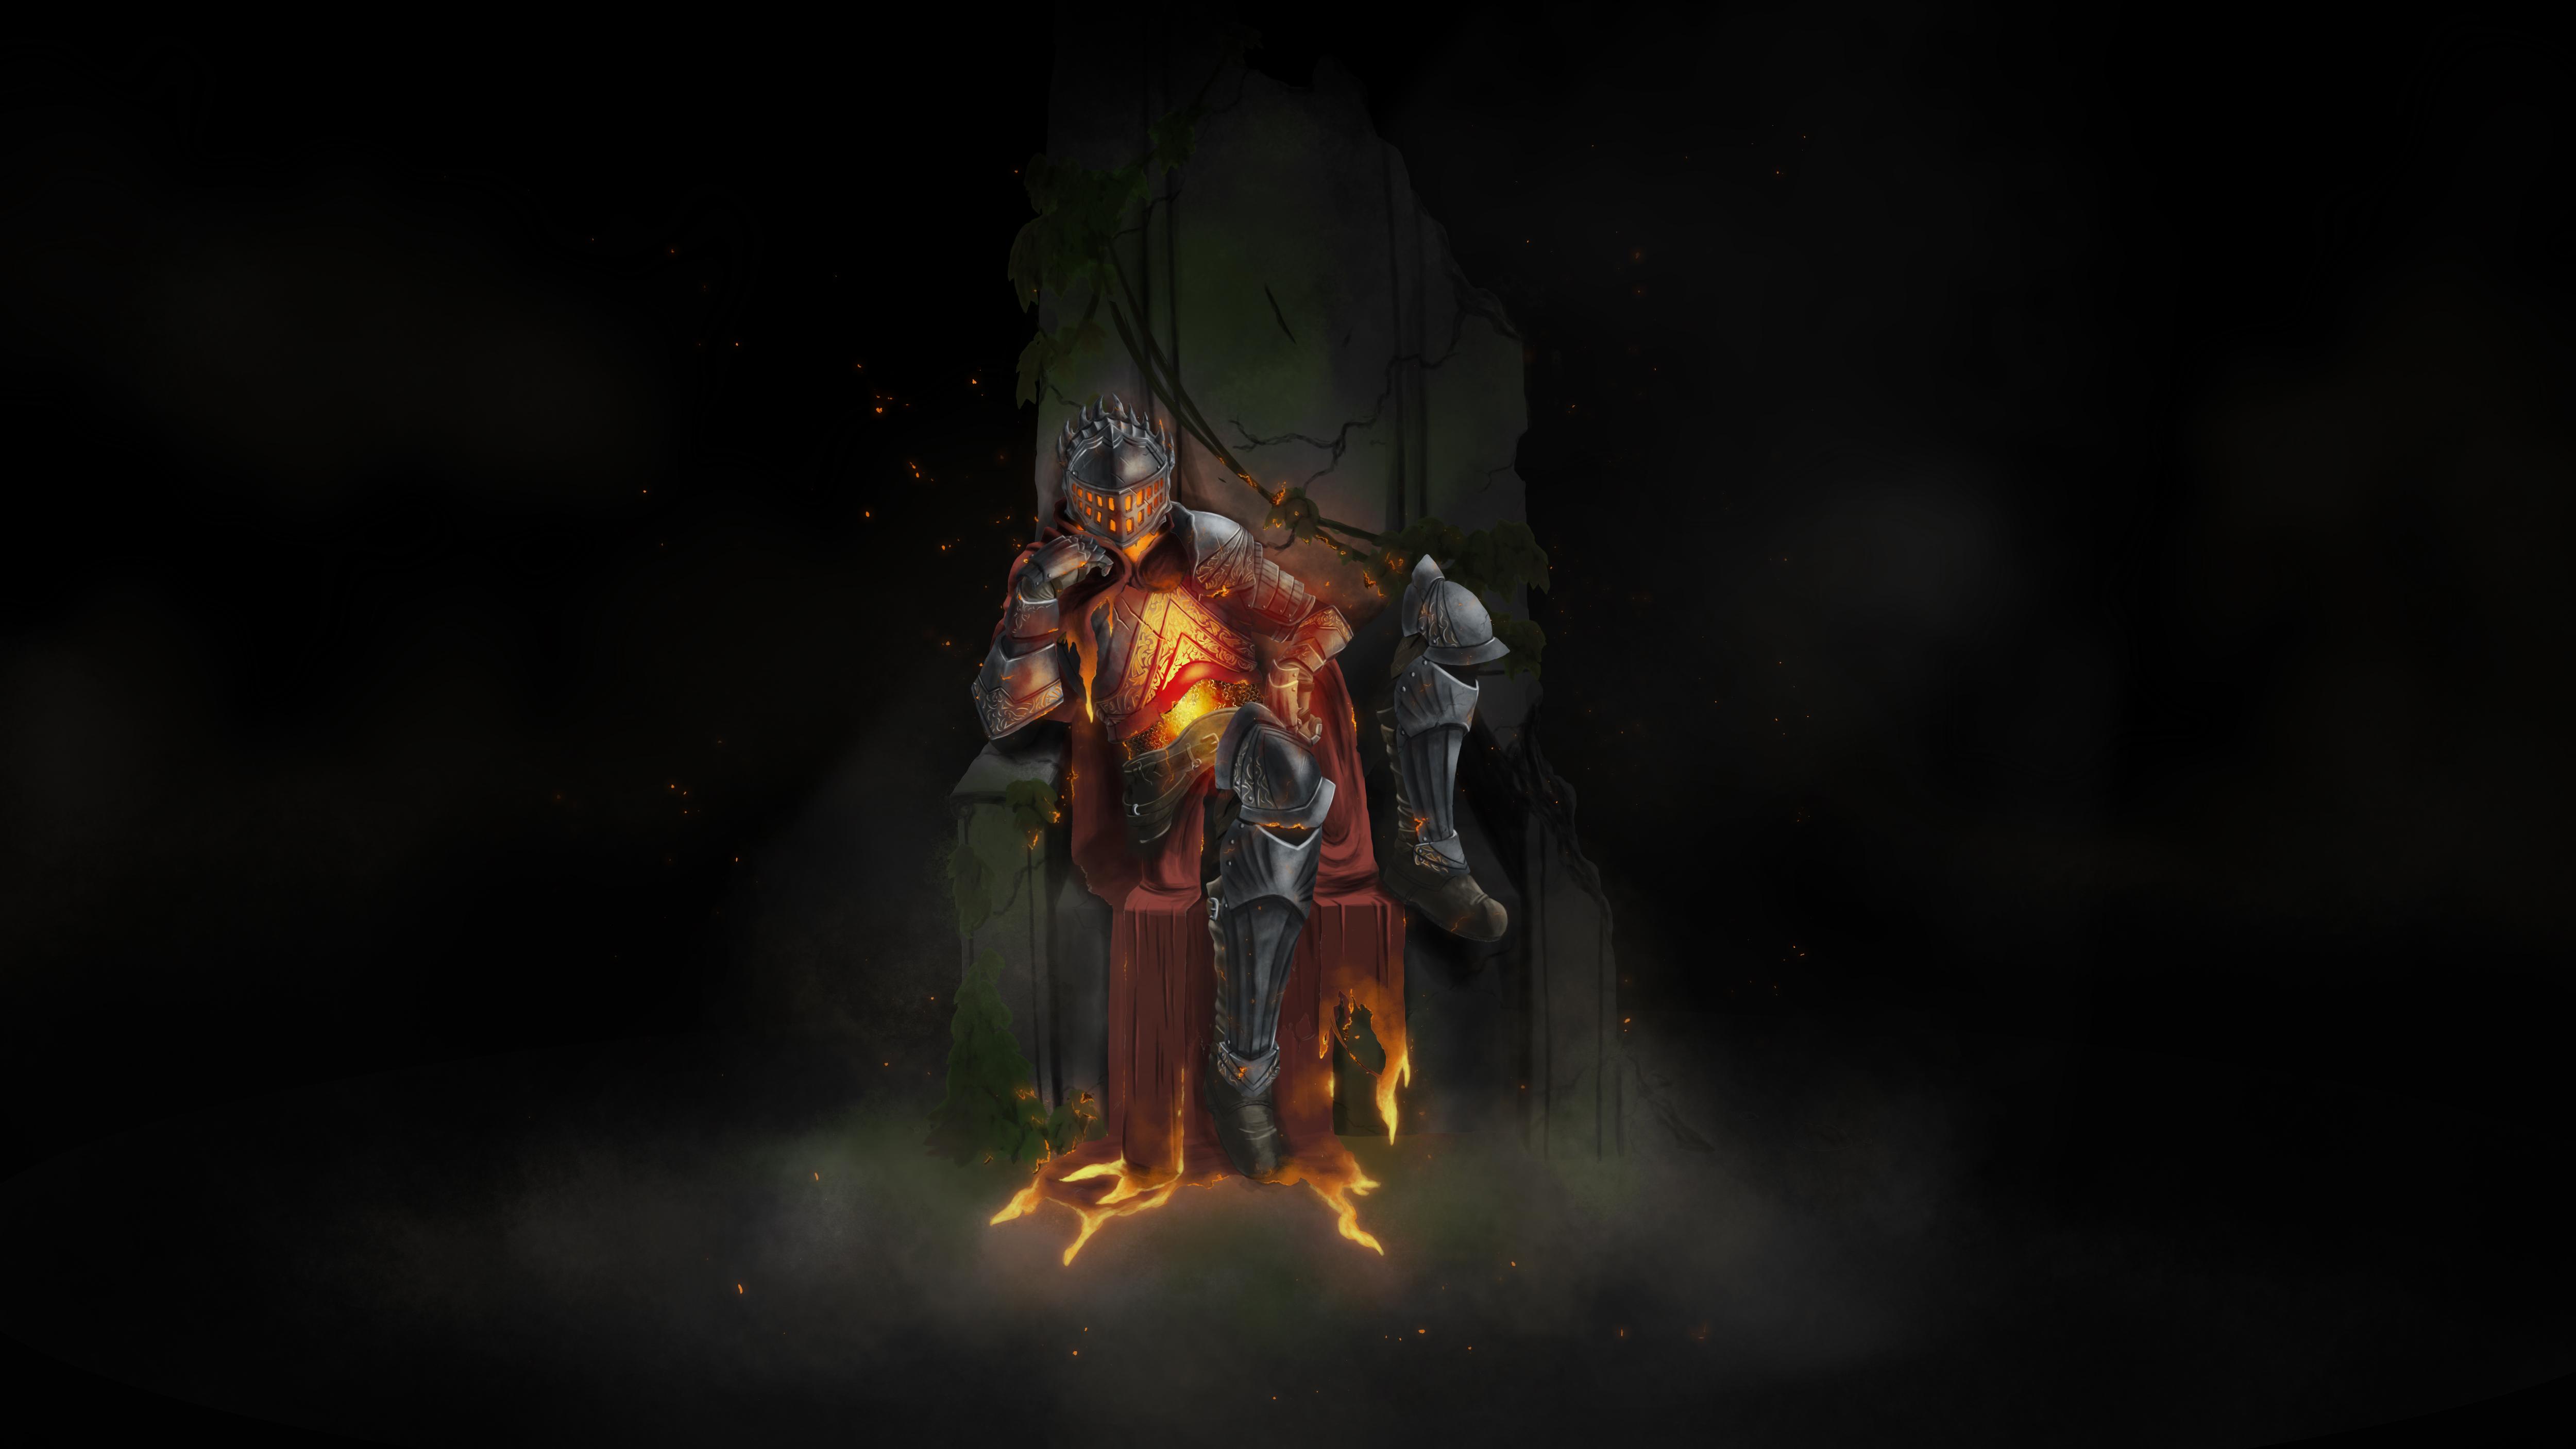 Dark Souls Iii Lord Of Cinder 4k Ultra Hd Wallpaper Background